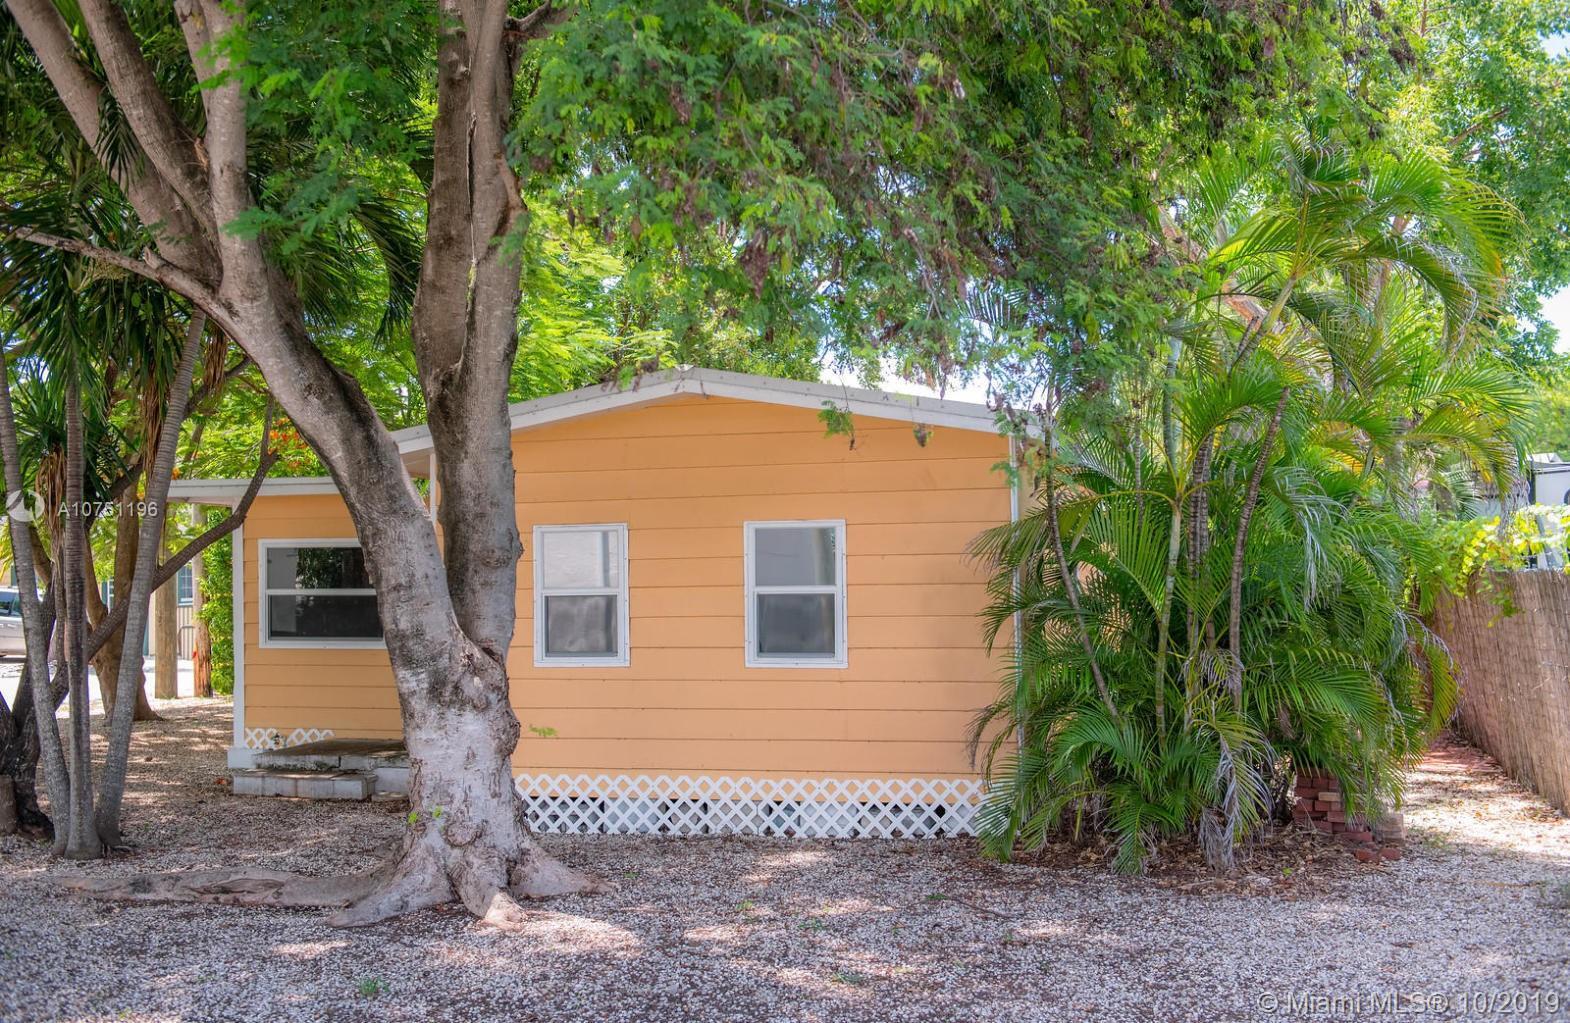 101 Poinciana Dr, Other City - Keys/Islands/Caribb, FL 33037 - Other City - Keys/Islands/Caribb, FL real estate listing